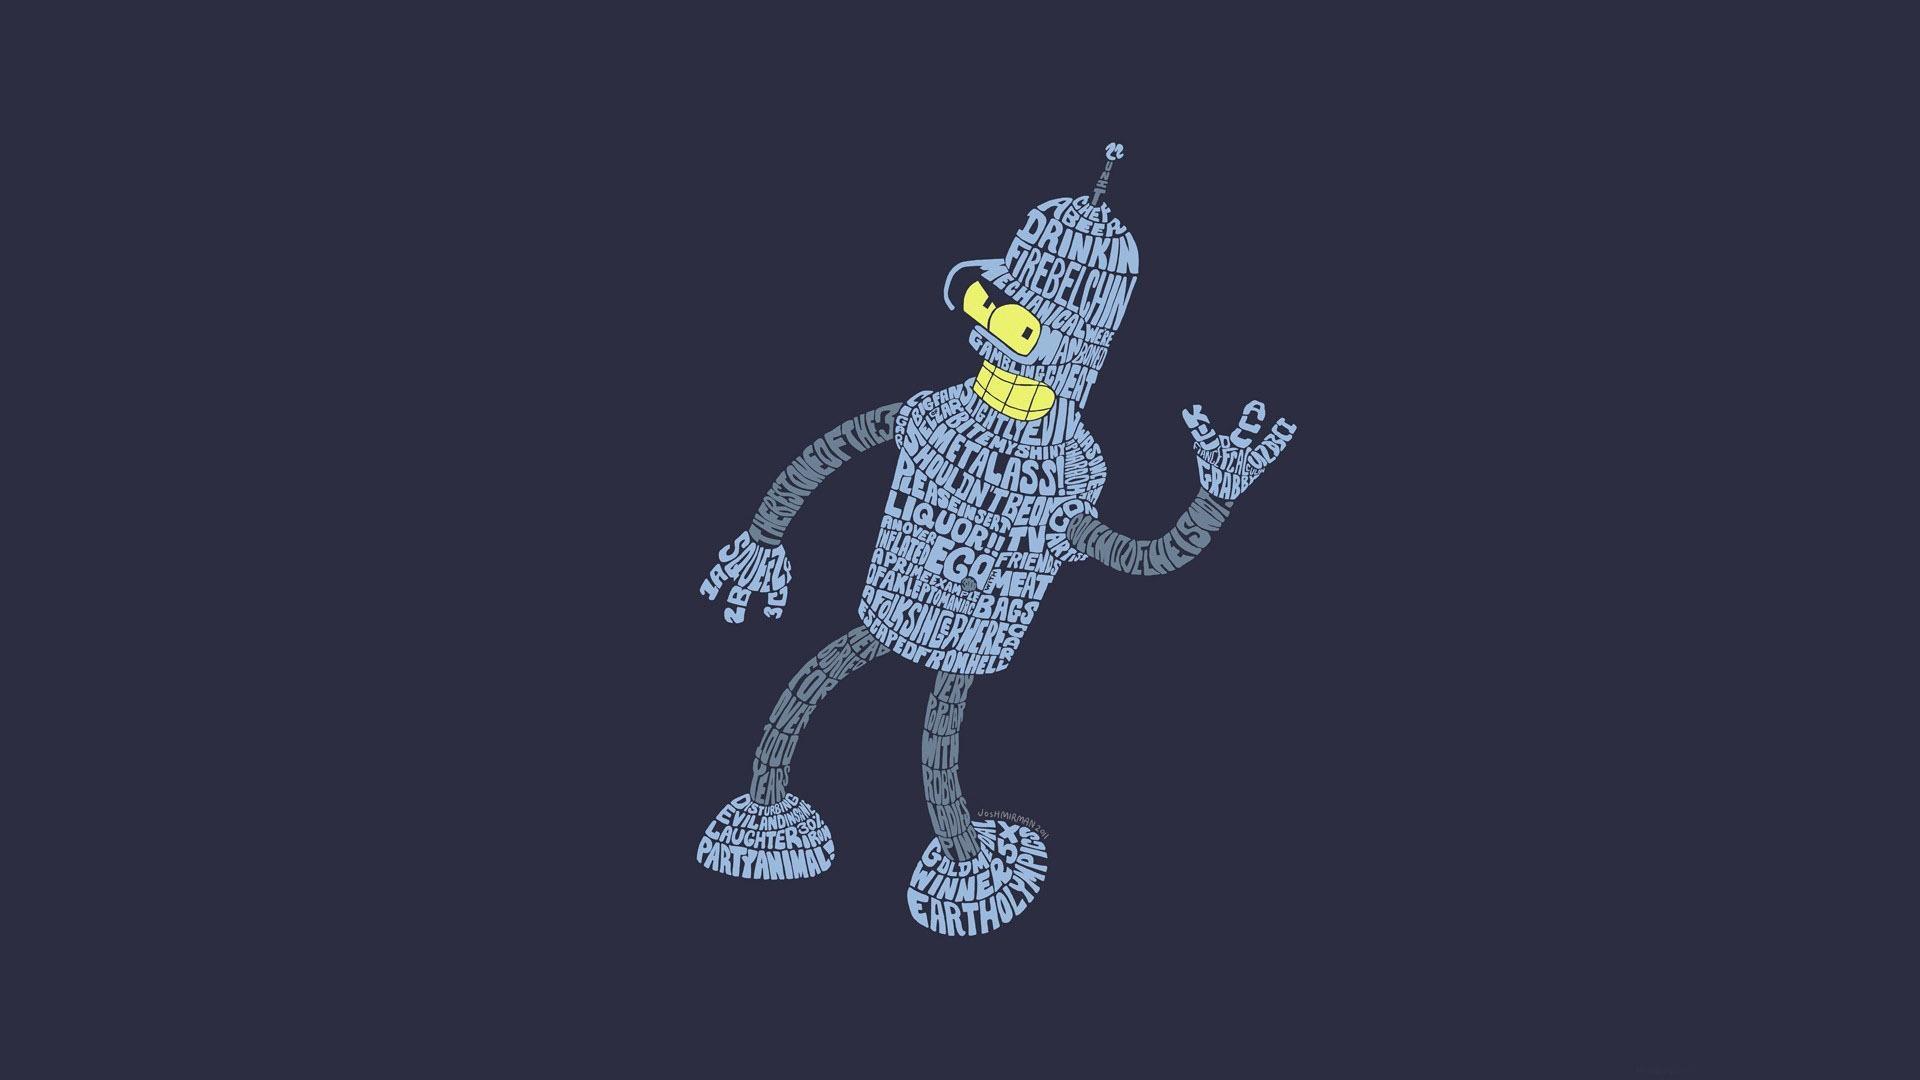 Futurama-Bender-HD-Wallpaper-for-Desktop